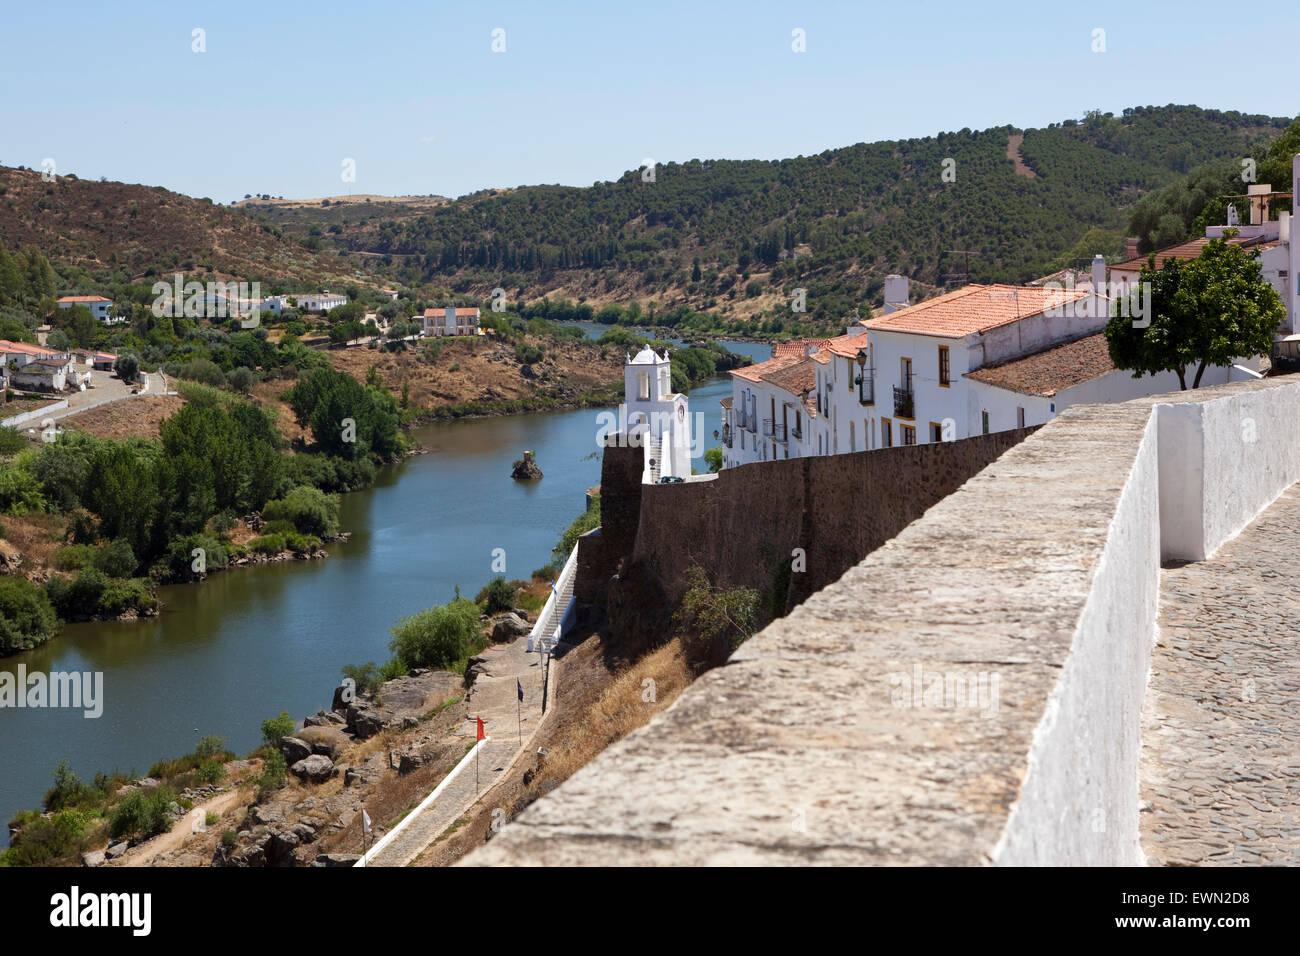 Mertola Beja Baixo Alentejo Portugal Europe Stock Photo: 84670804 - Alamy